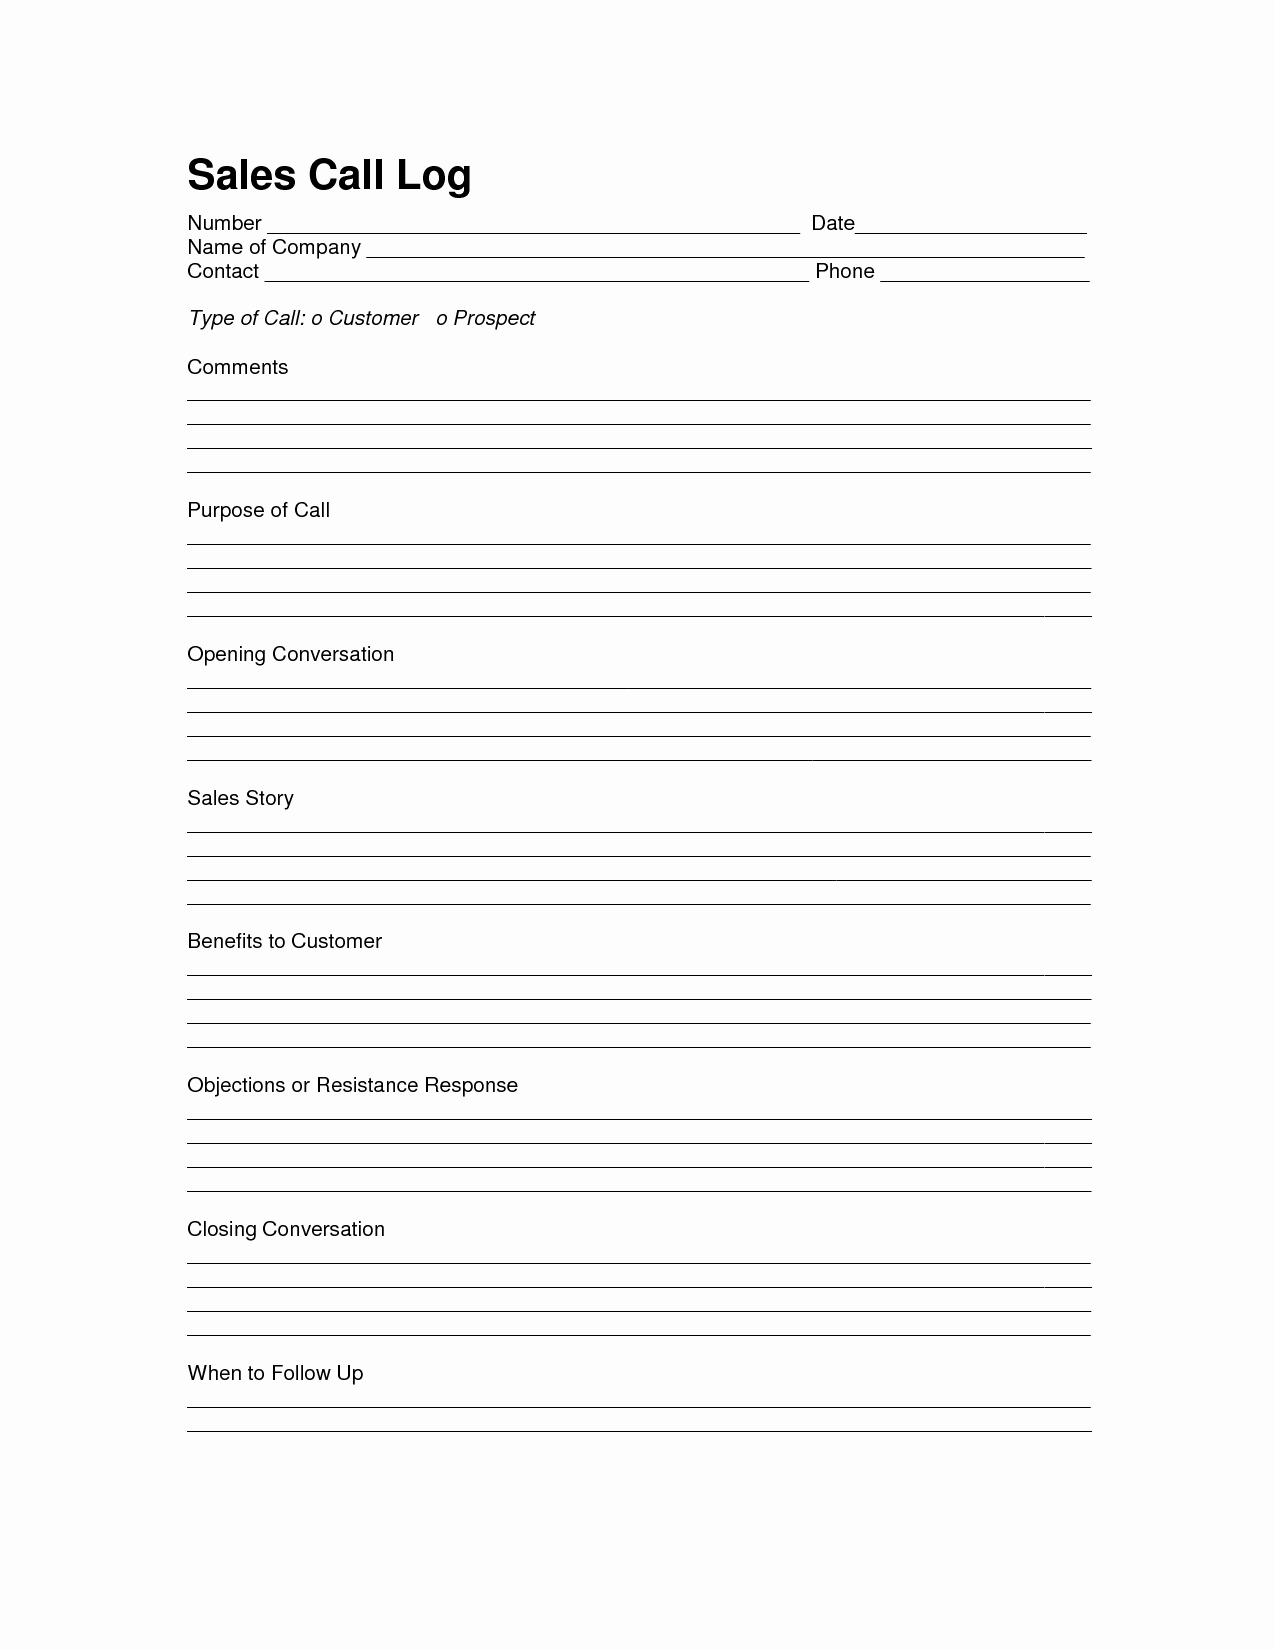 Sales Call Log Template Fresh Sales Log Sheet Template Sales Call Log Template